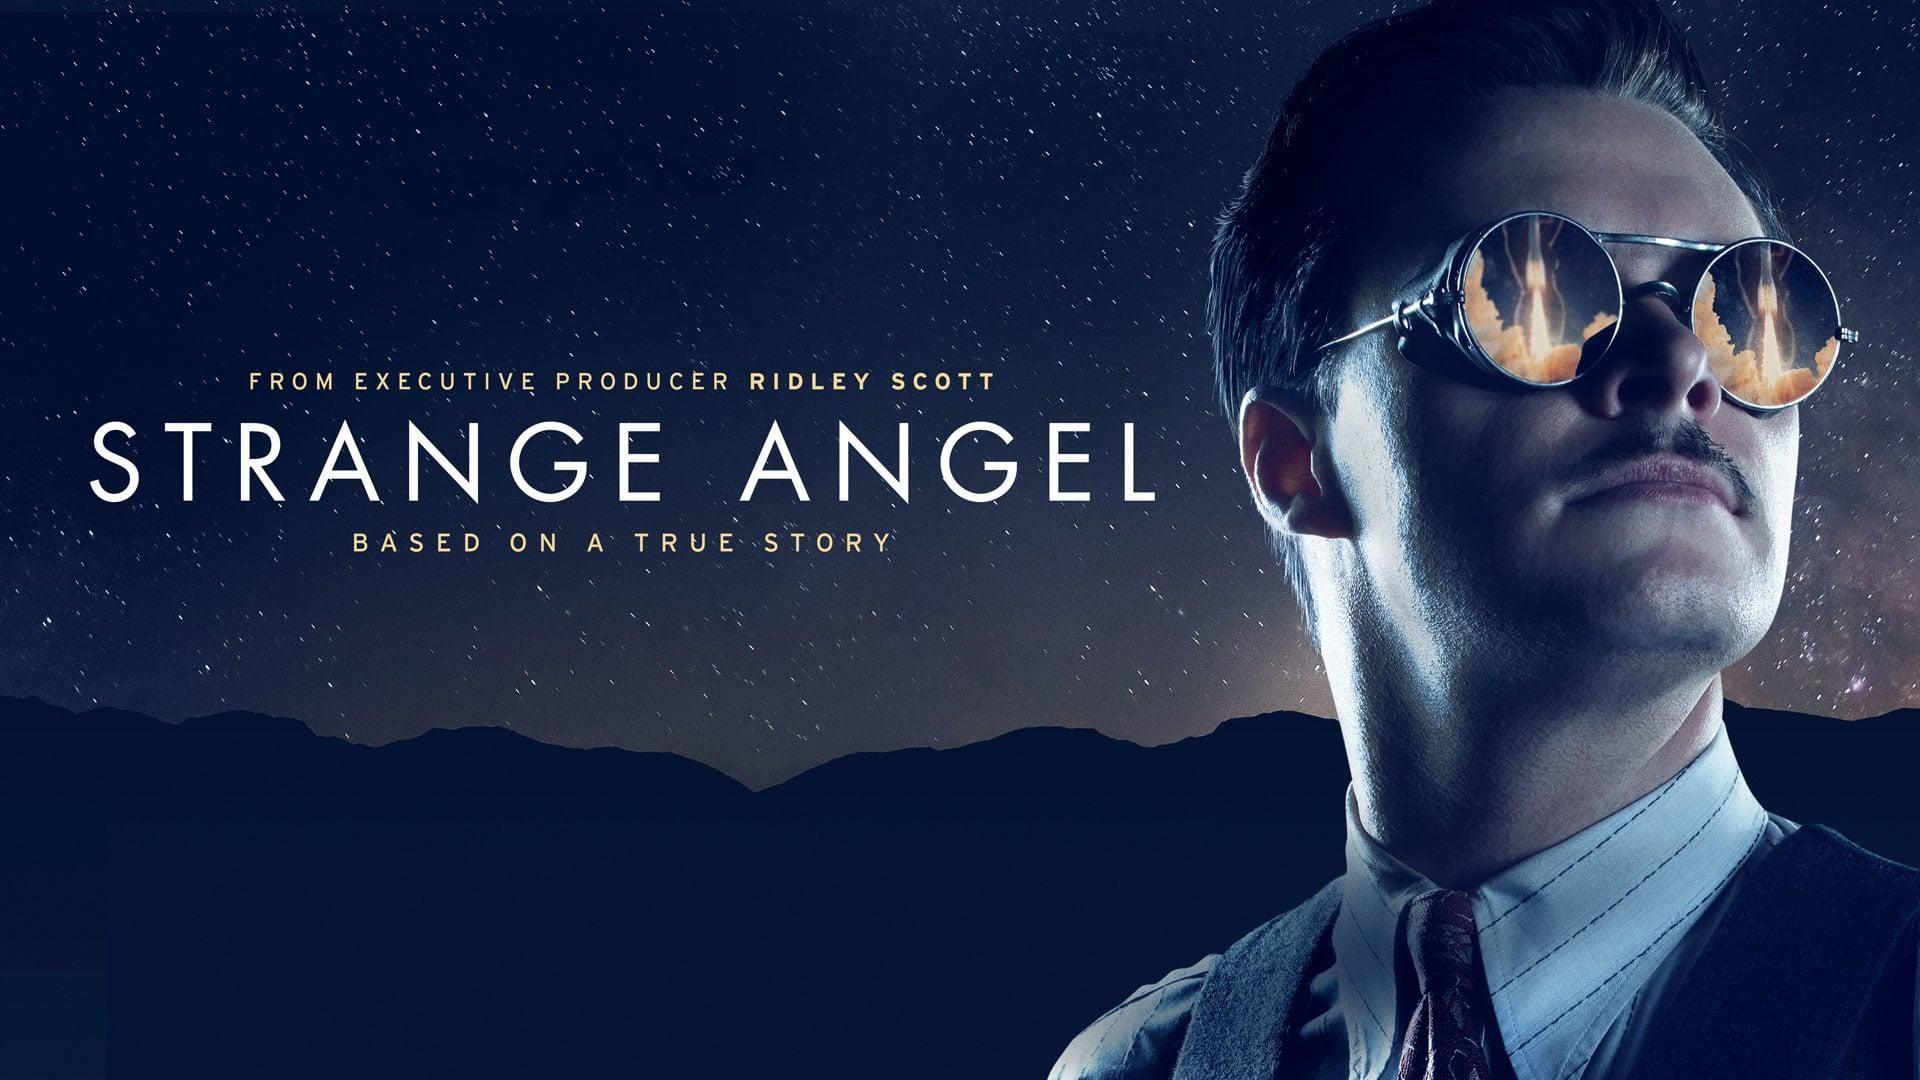 Show Strange Angel